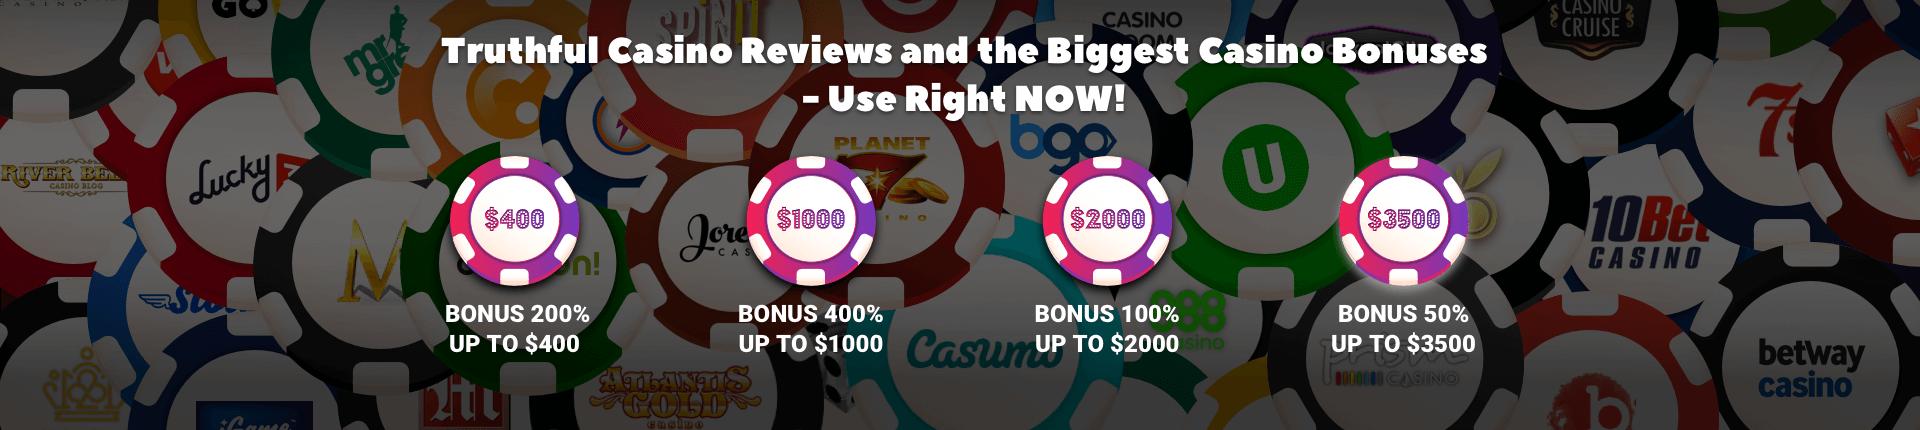 online casinos reviews banner